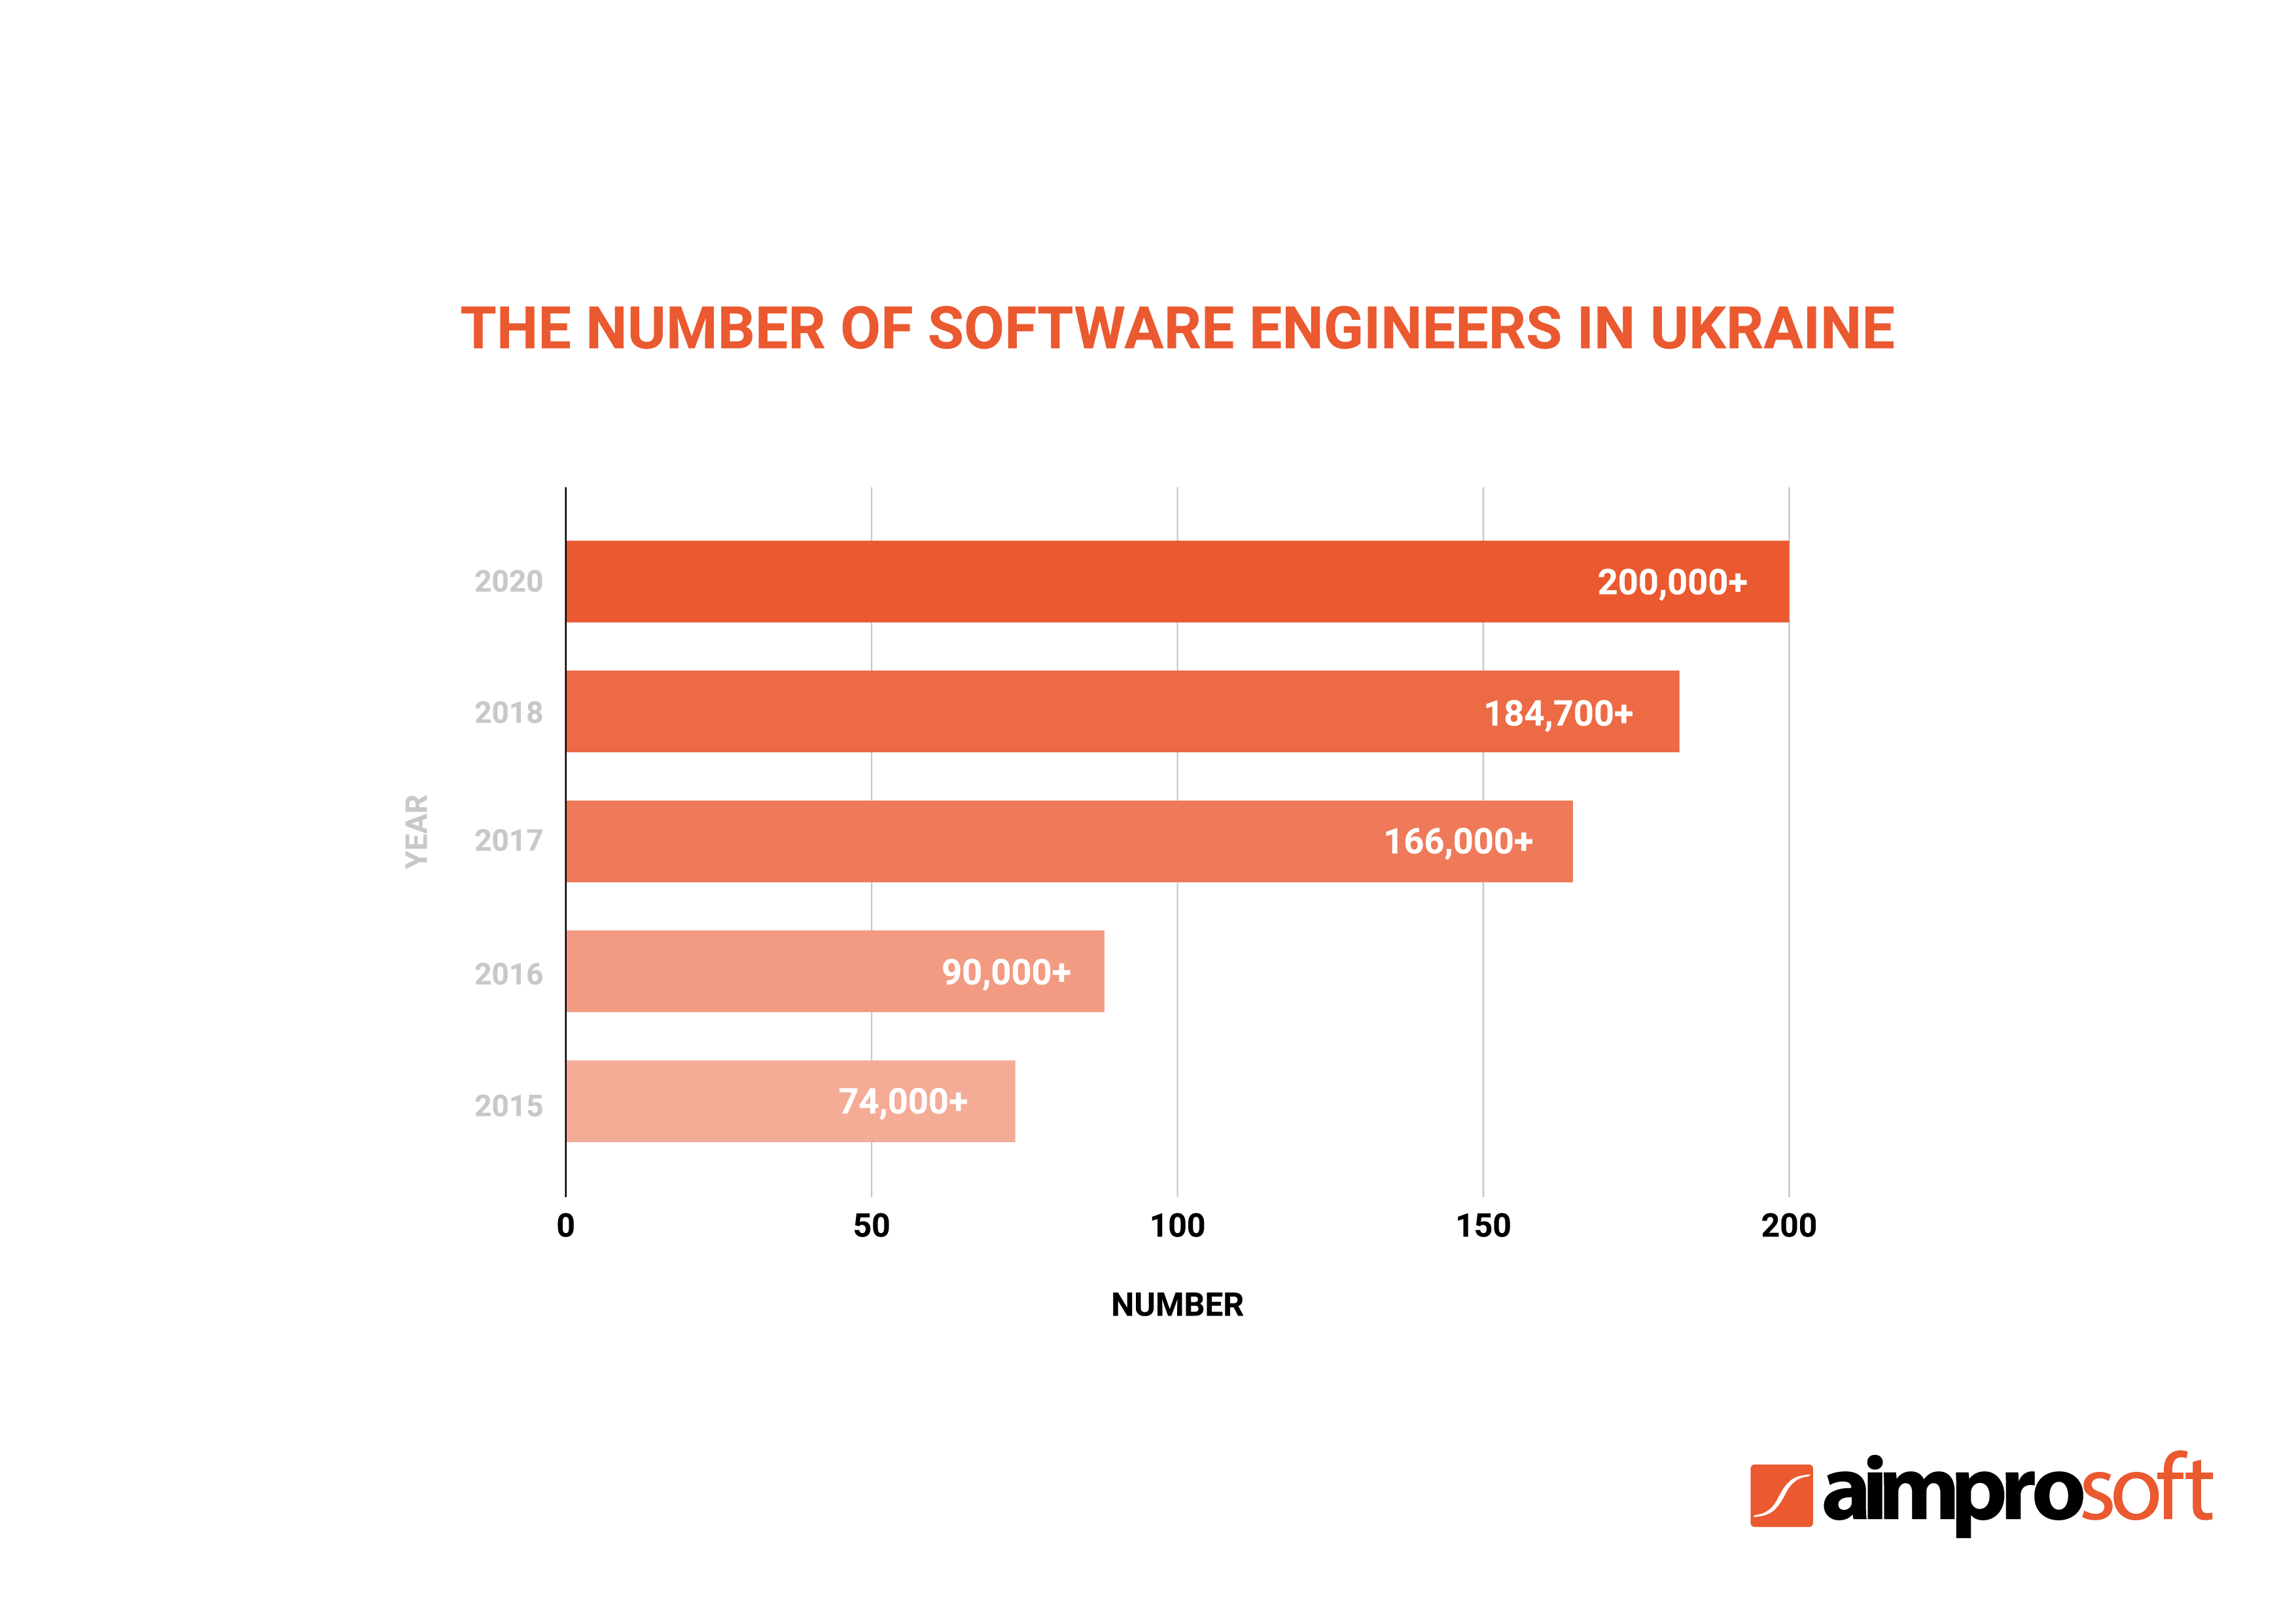 The number of software engineers in Ukraine